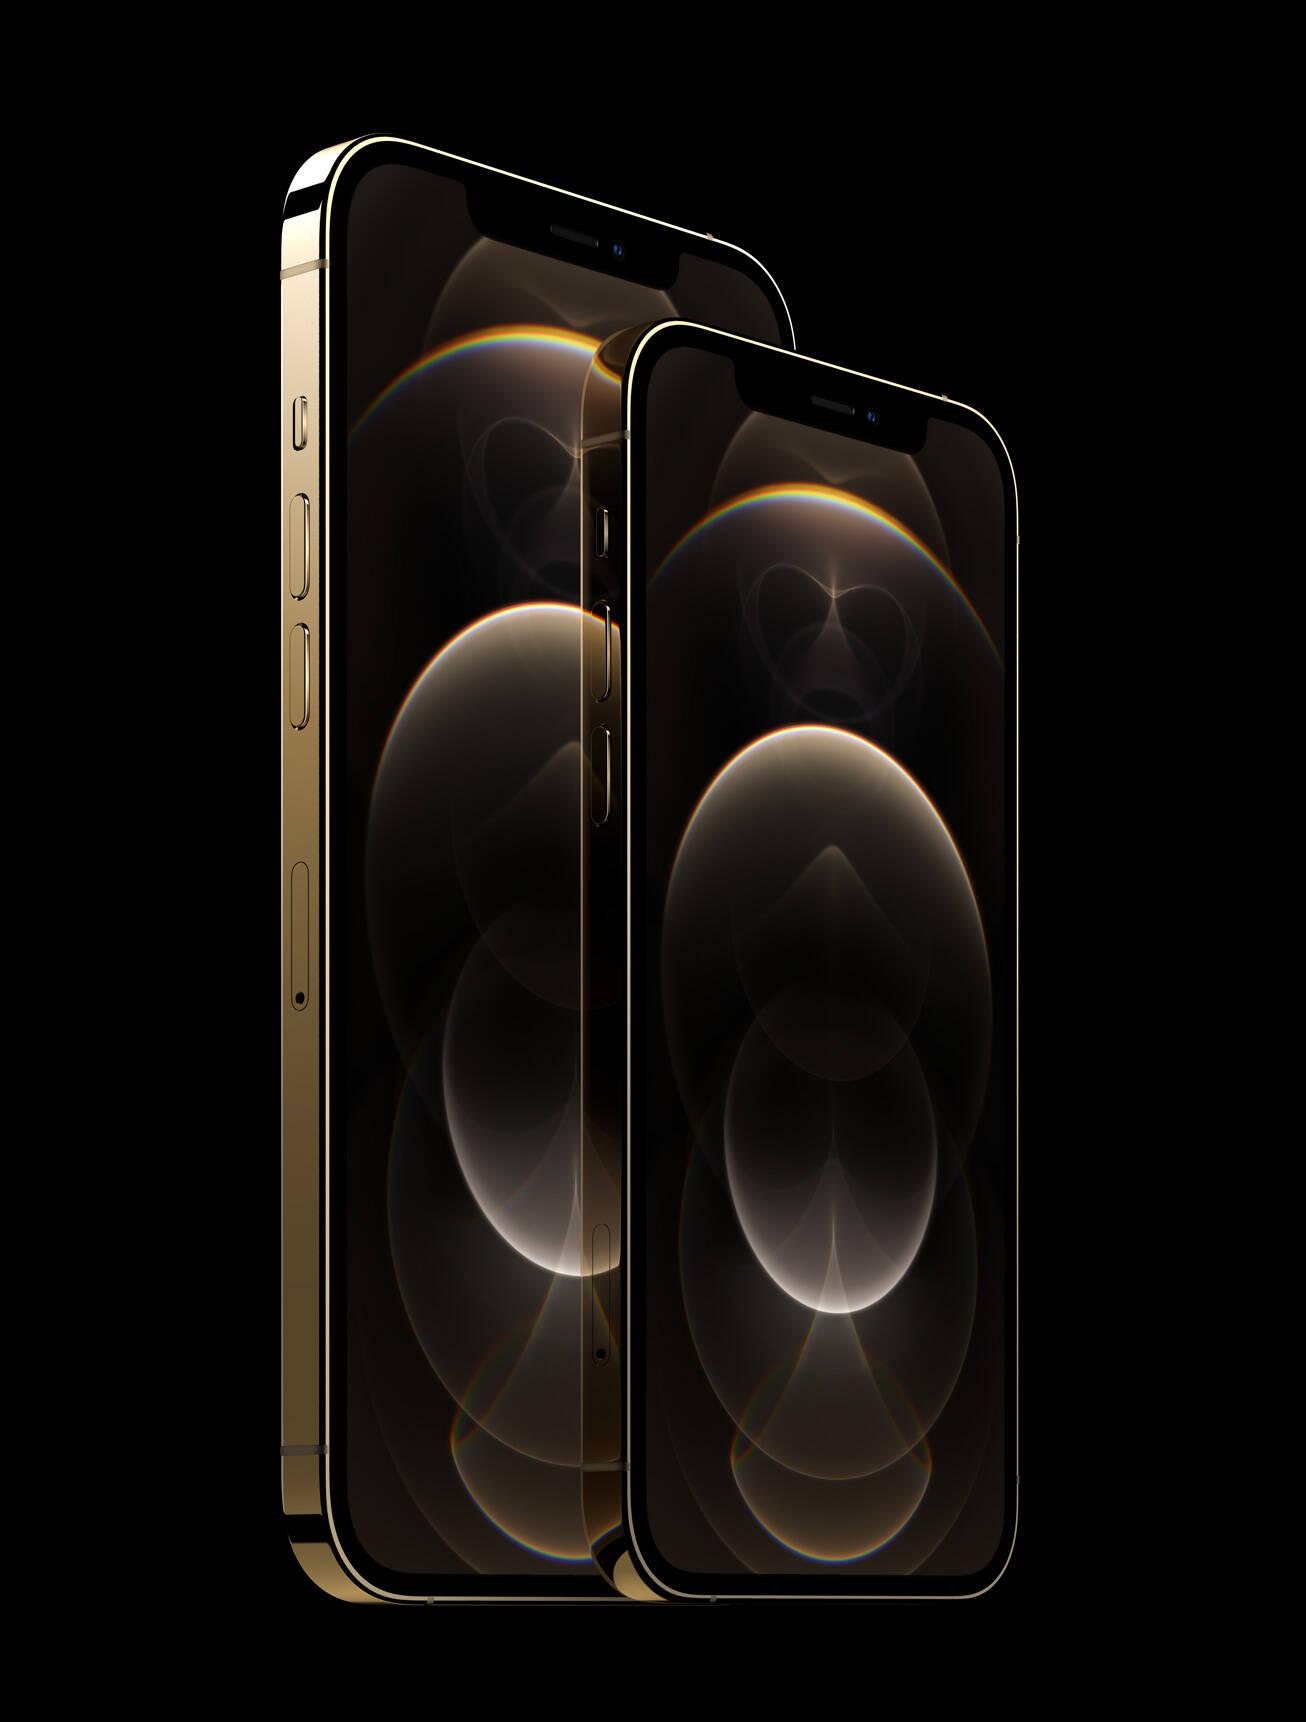 Apple iPhone 12 chega sem fone e nem carregador inclusos